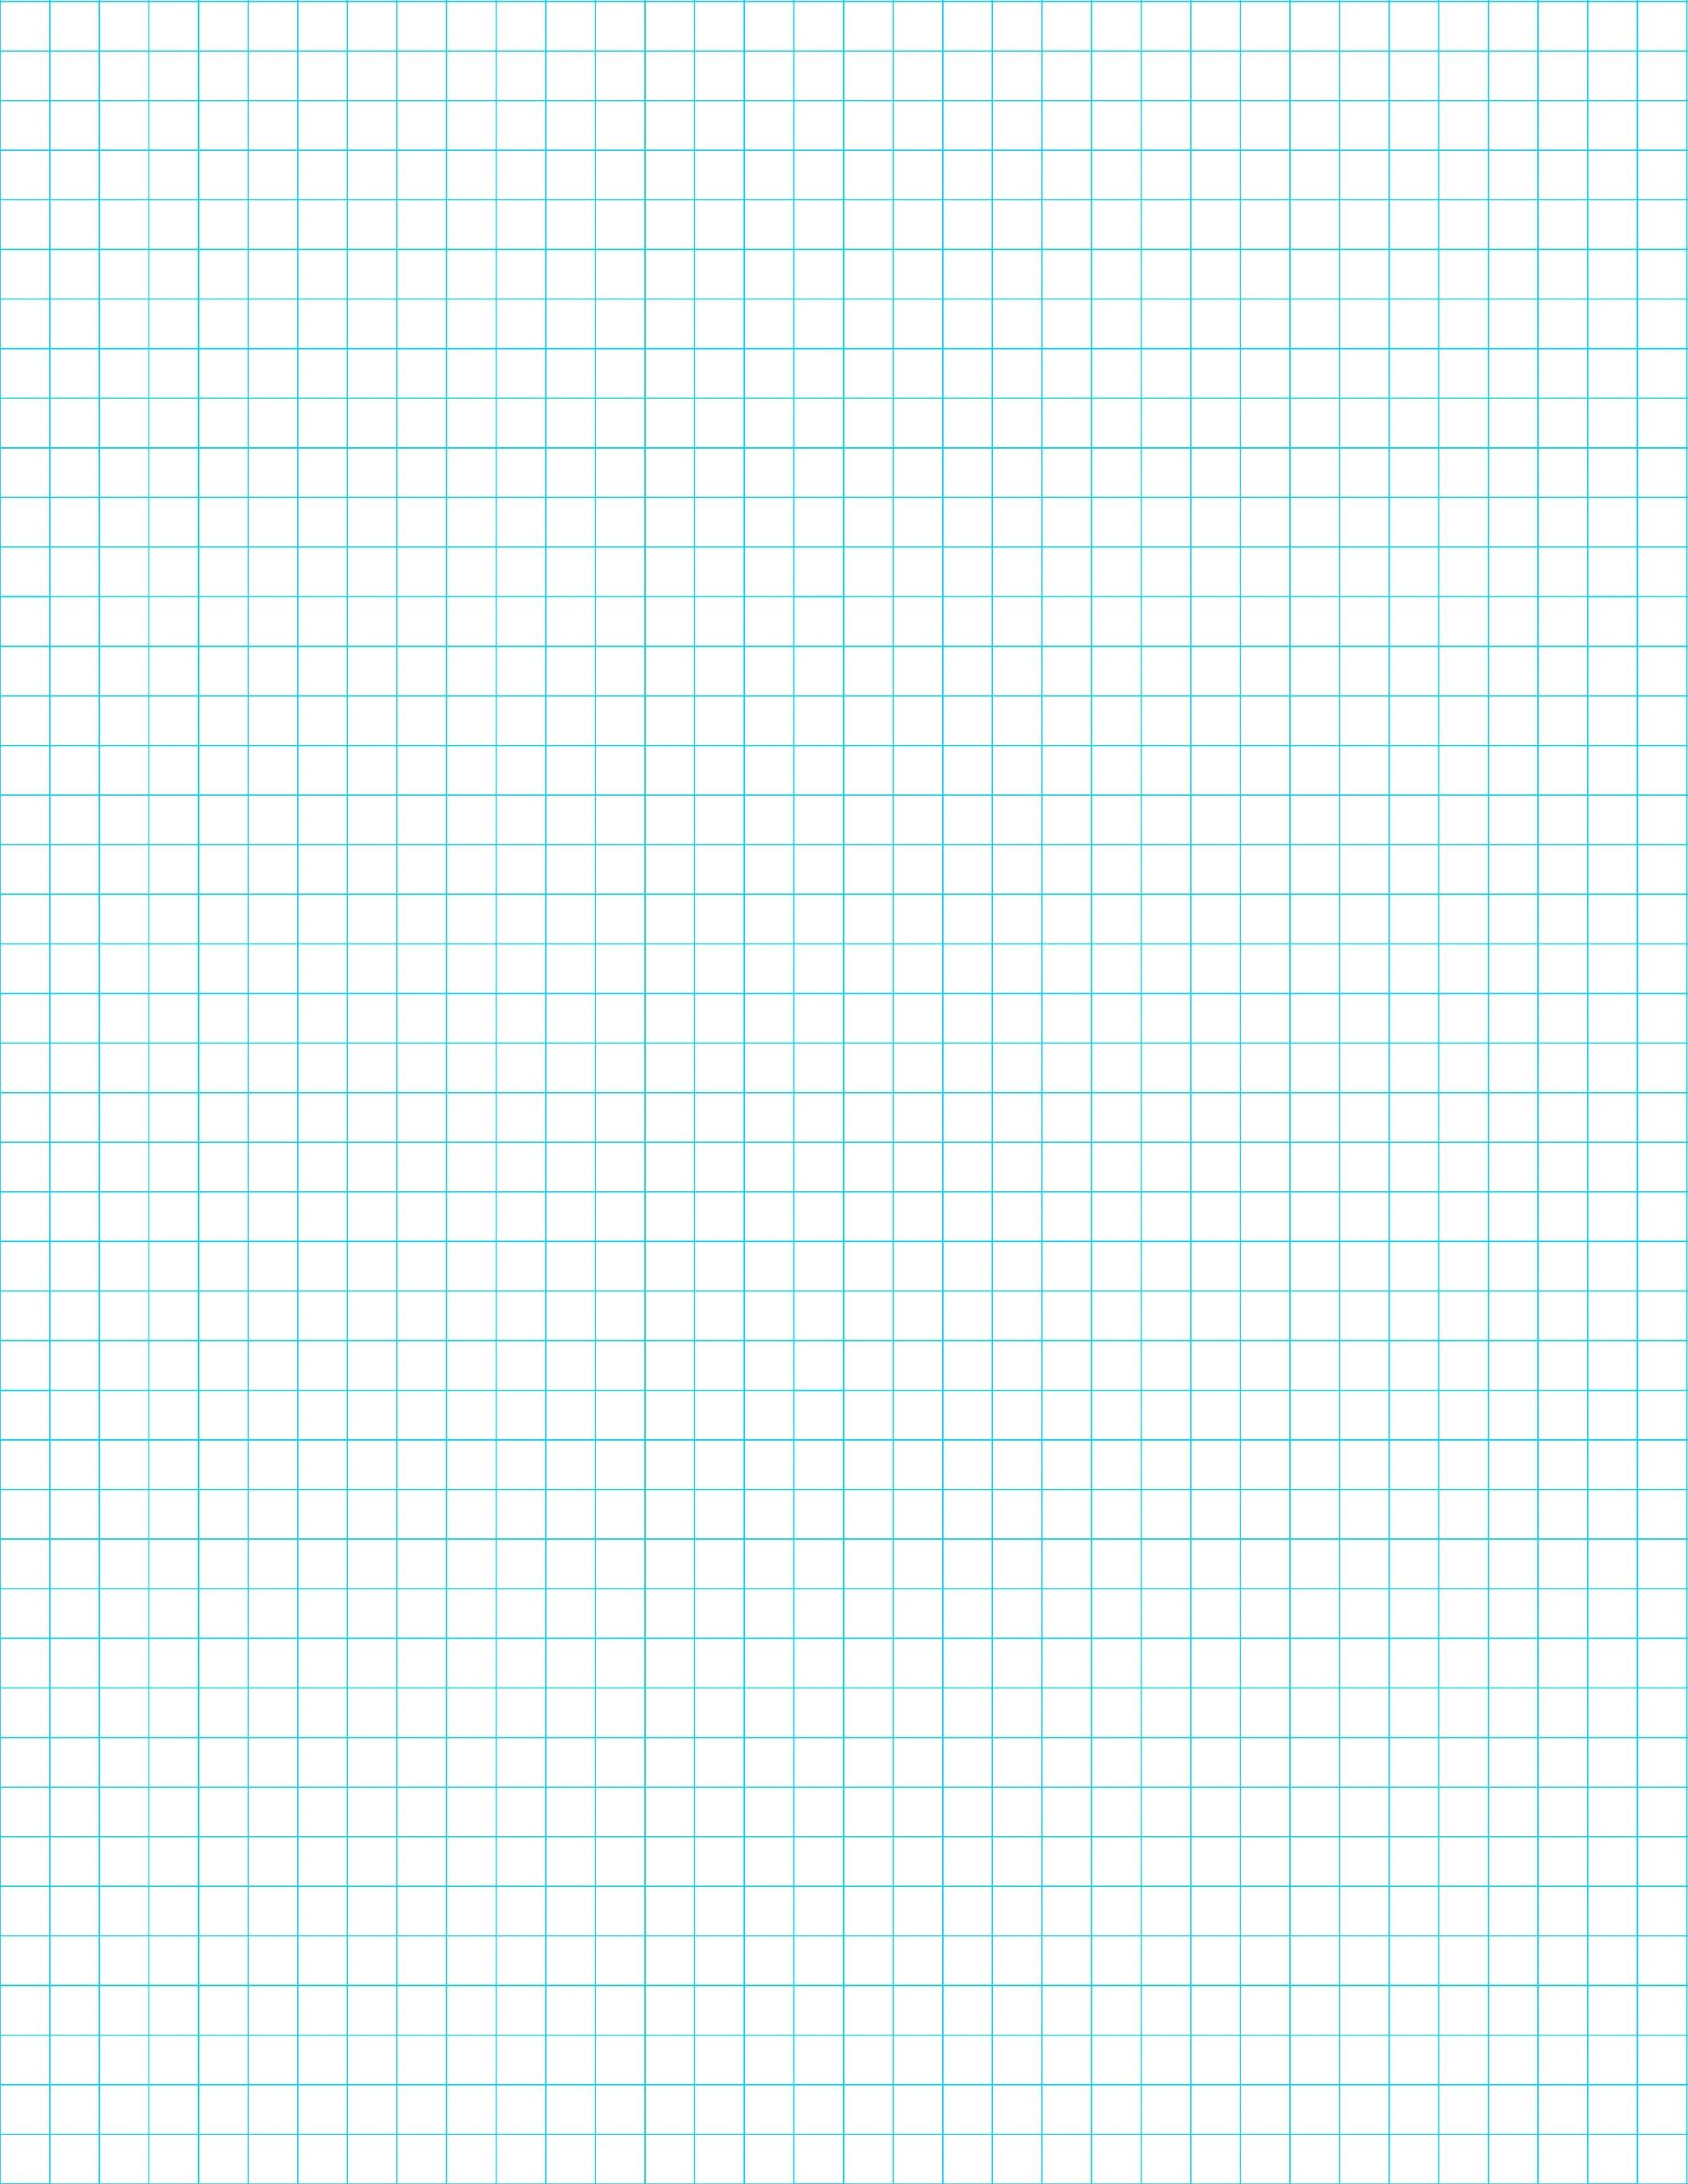 Free Printable Graph Paper - Paper Trail Design - Half Inch Grid Paper Free Printable